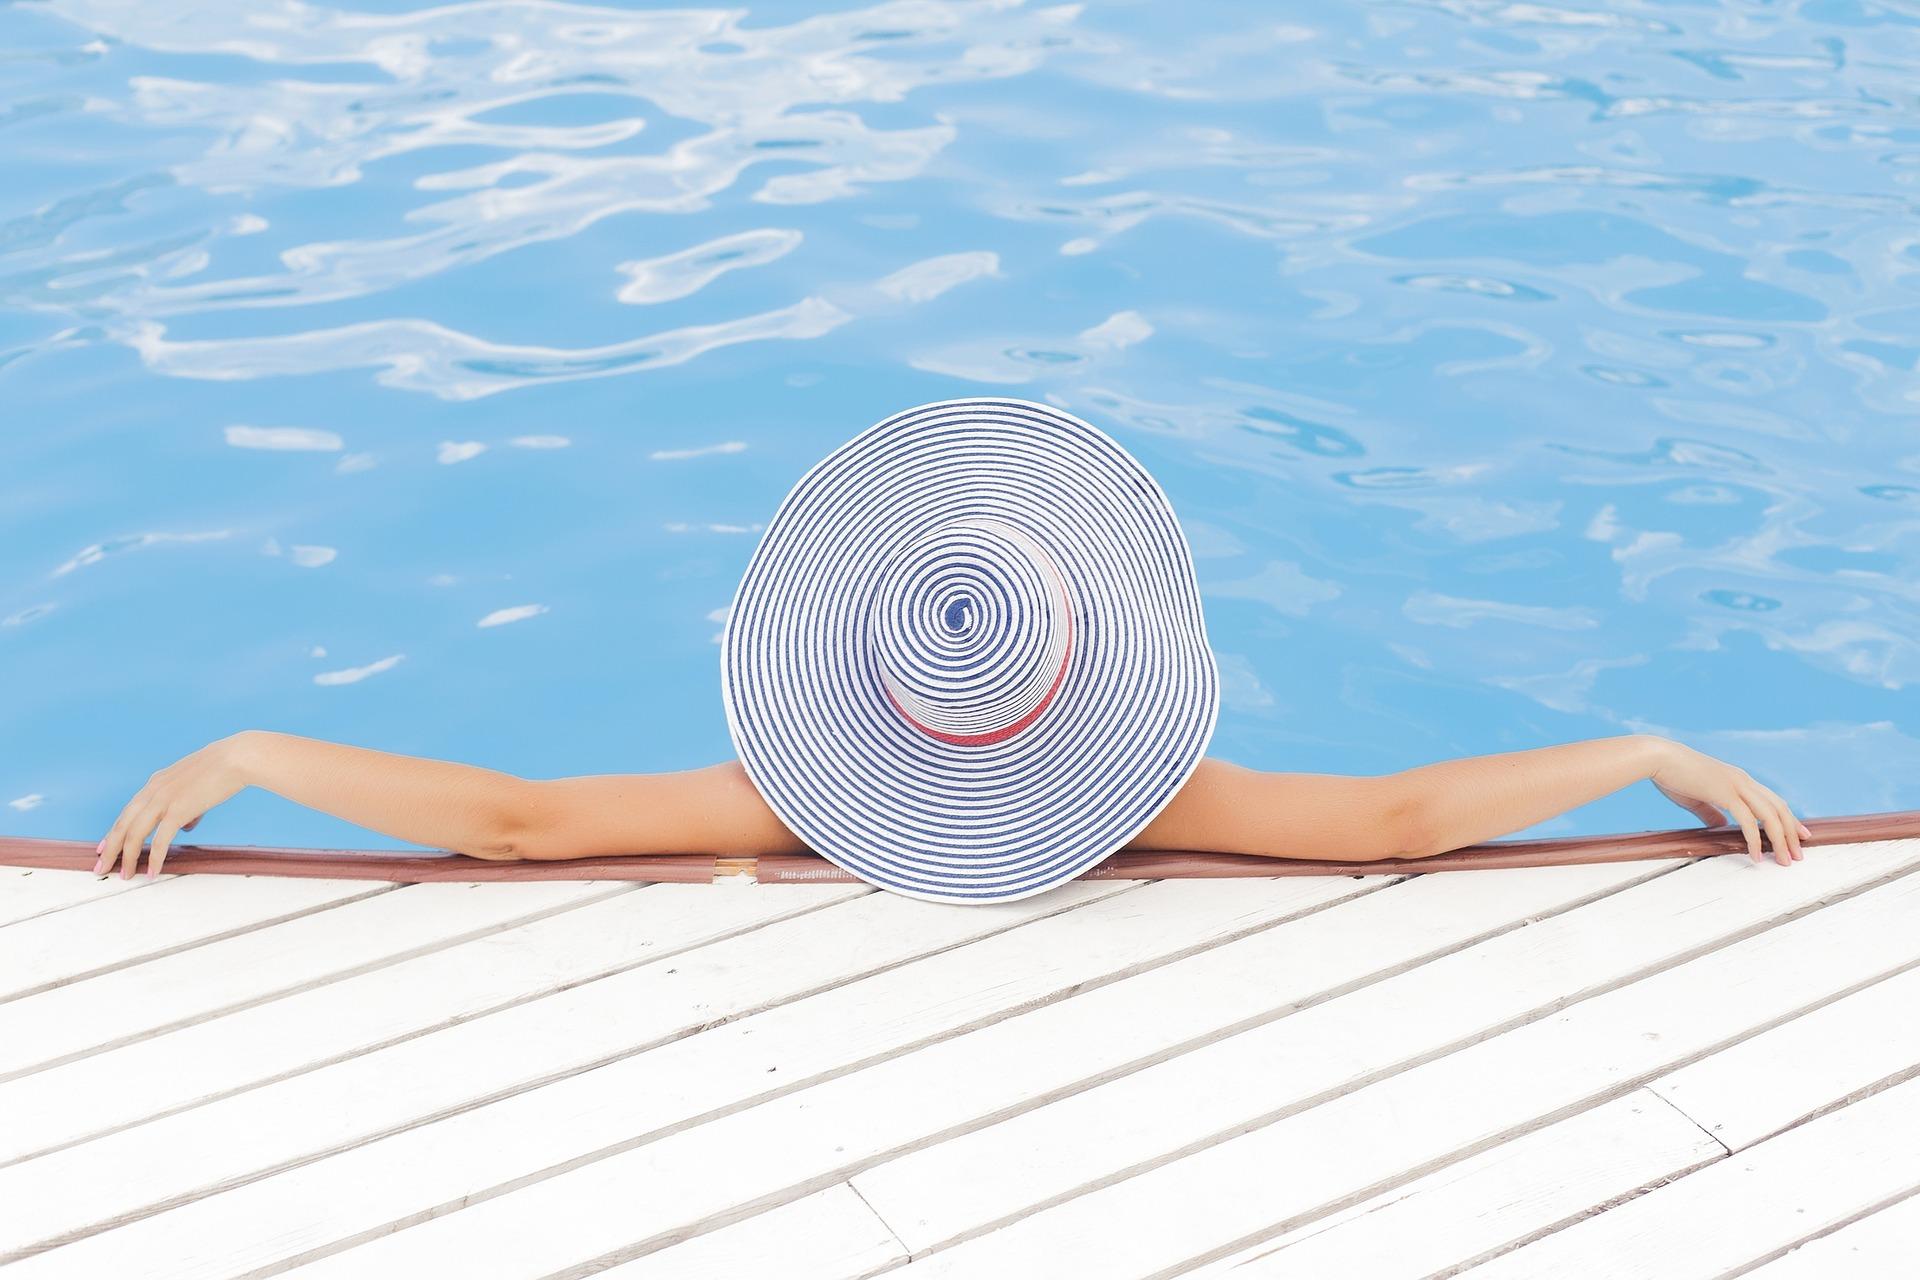 Enjoy summer leisure poolside